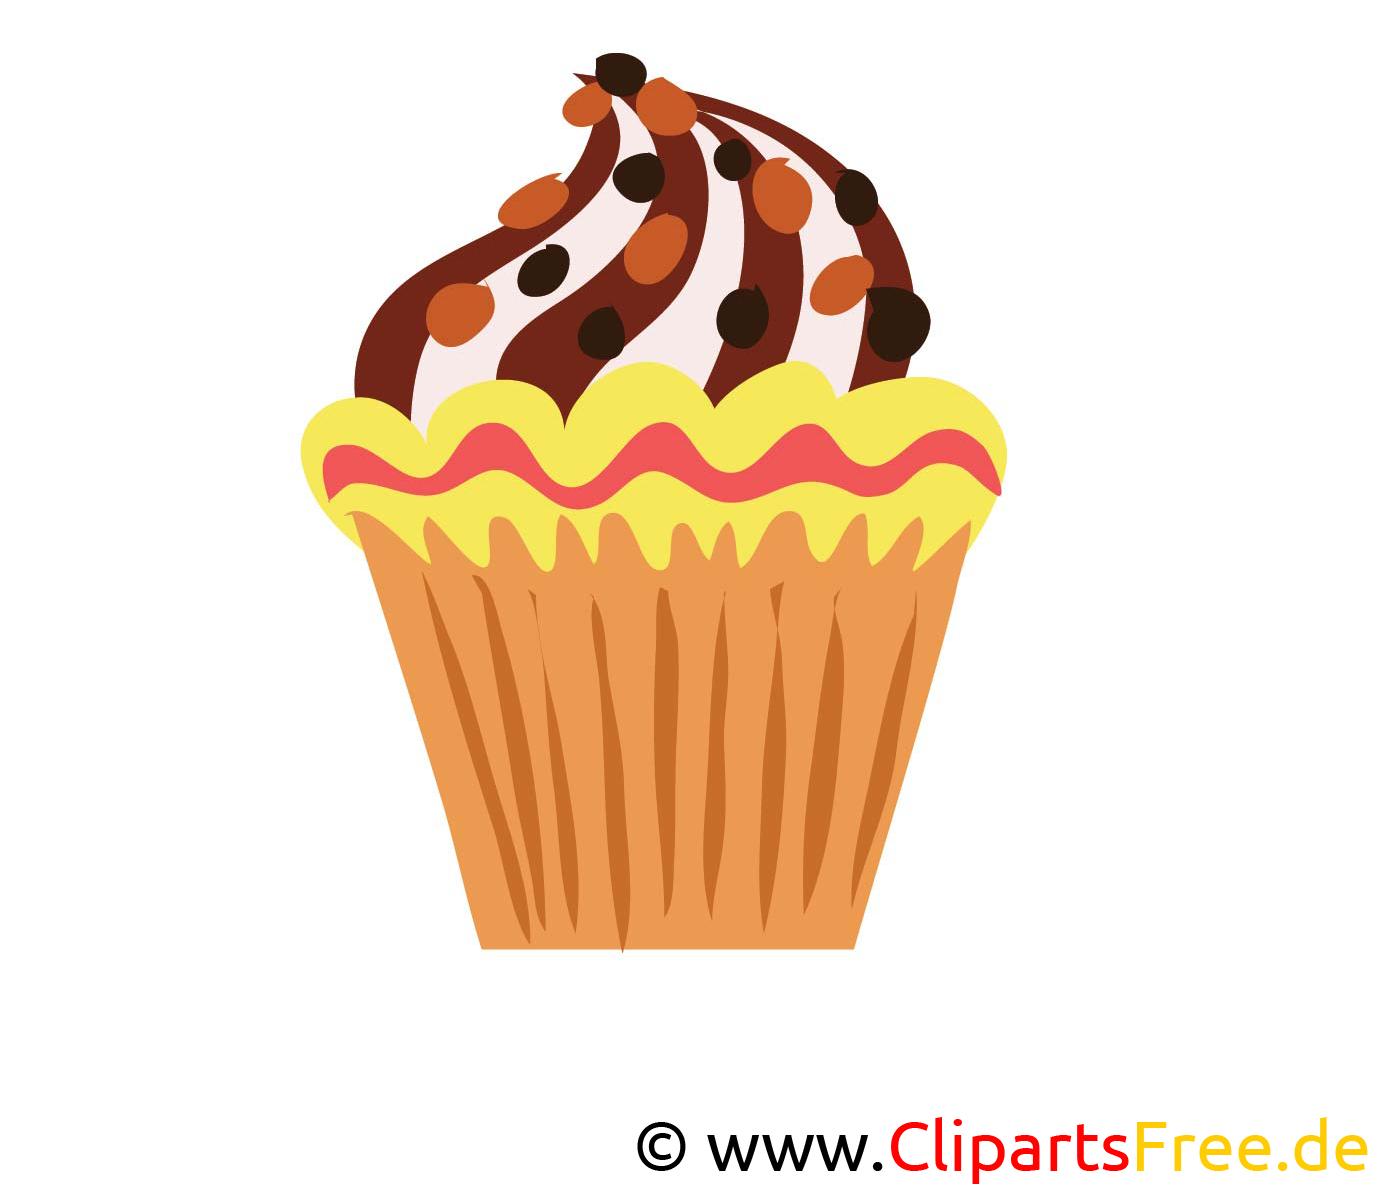 Petit gâteau image gratuite - Nourriture cliparts